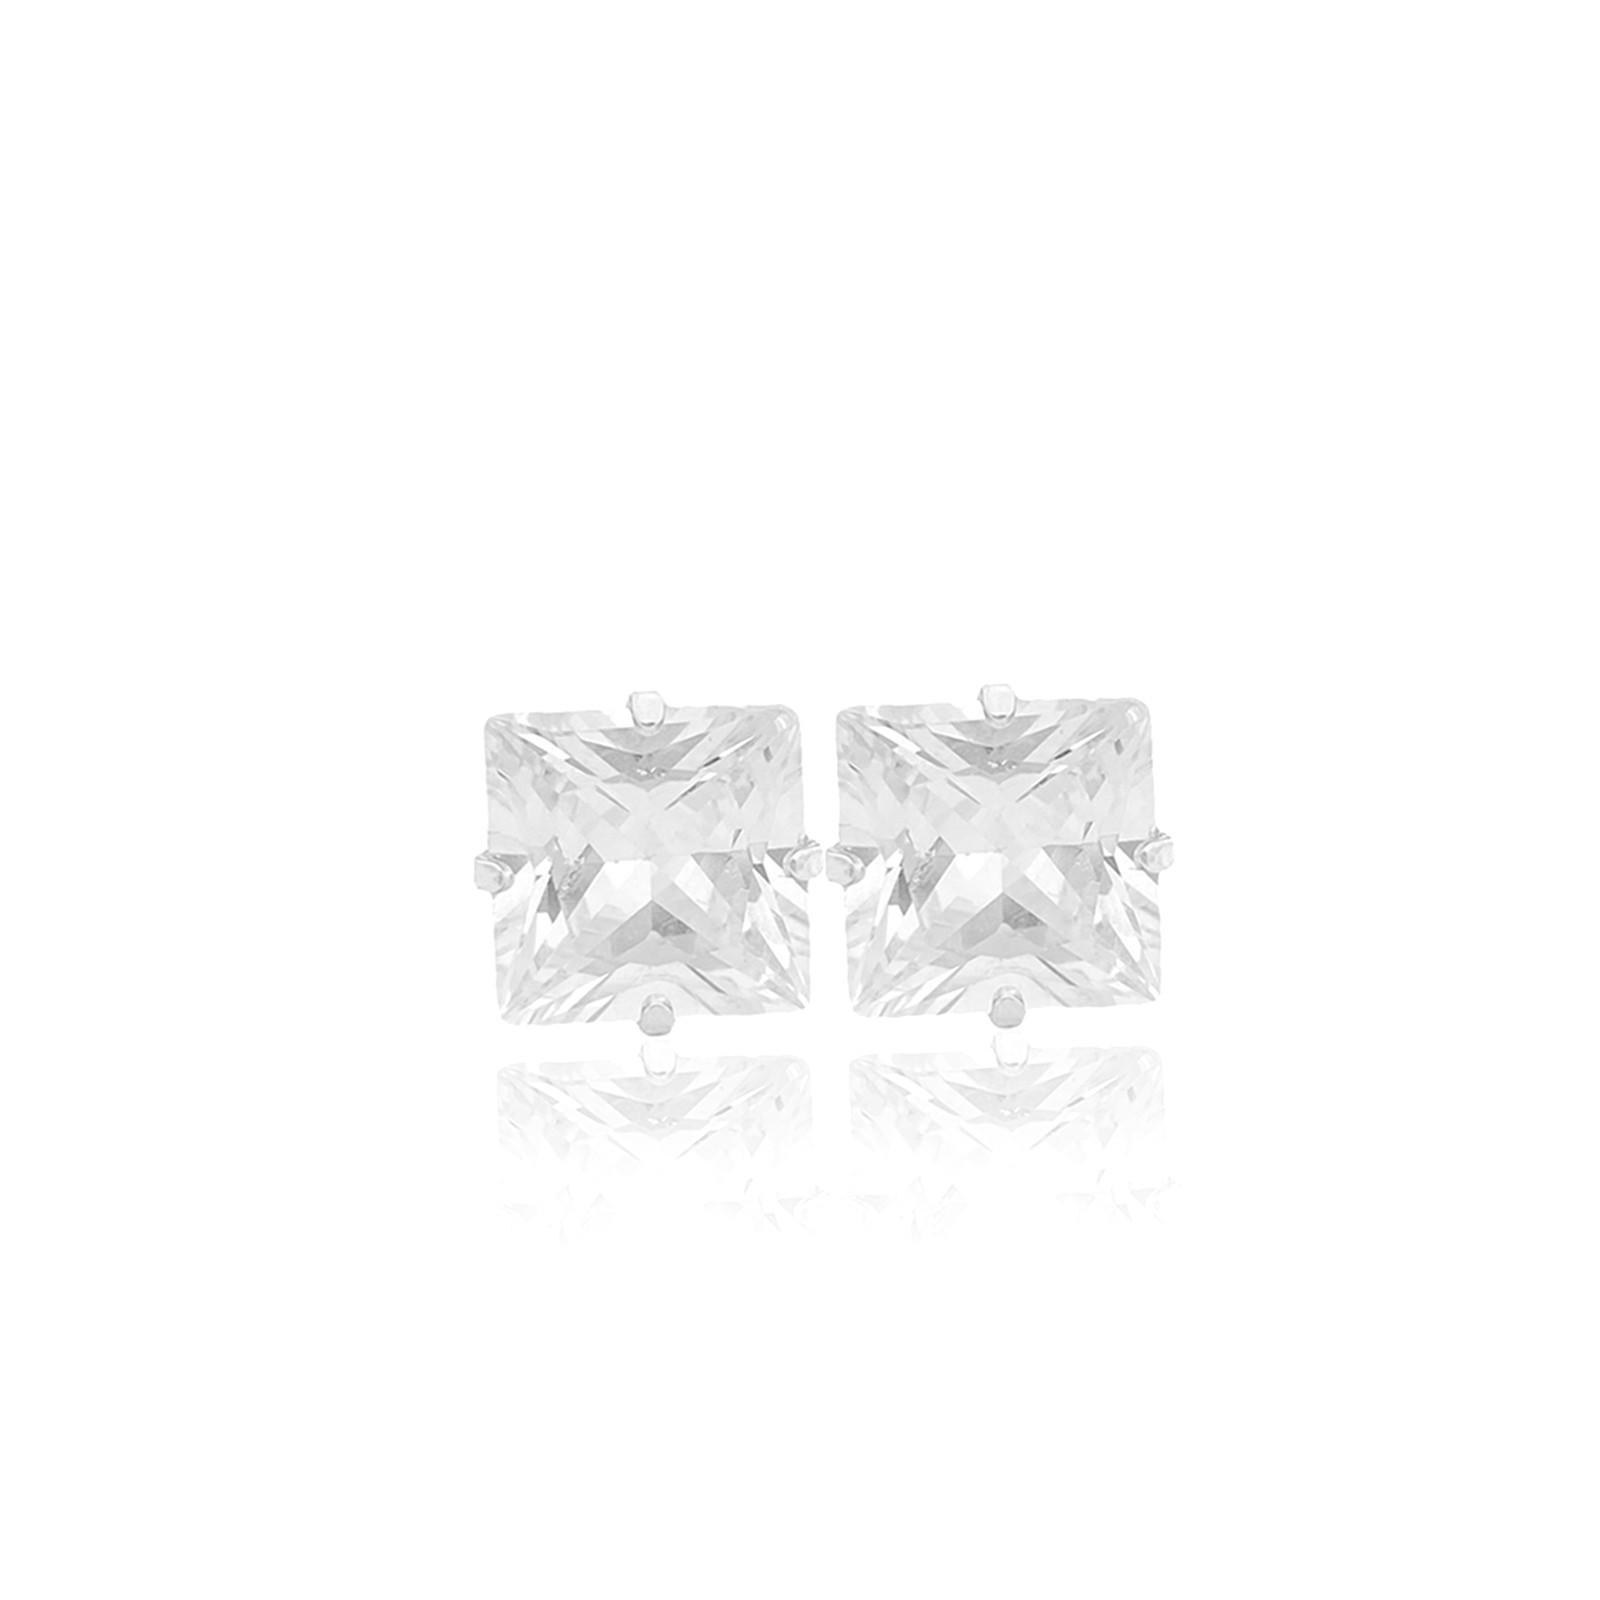 Brinco Pedra De Zircônia  5mm X 5mm (Prata 925 Italiana)